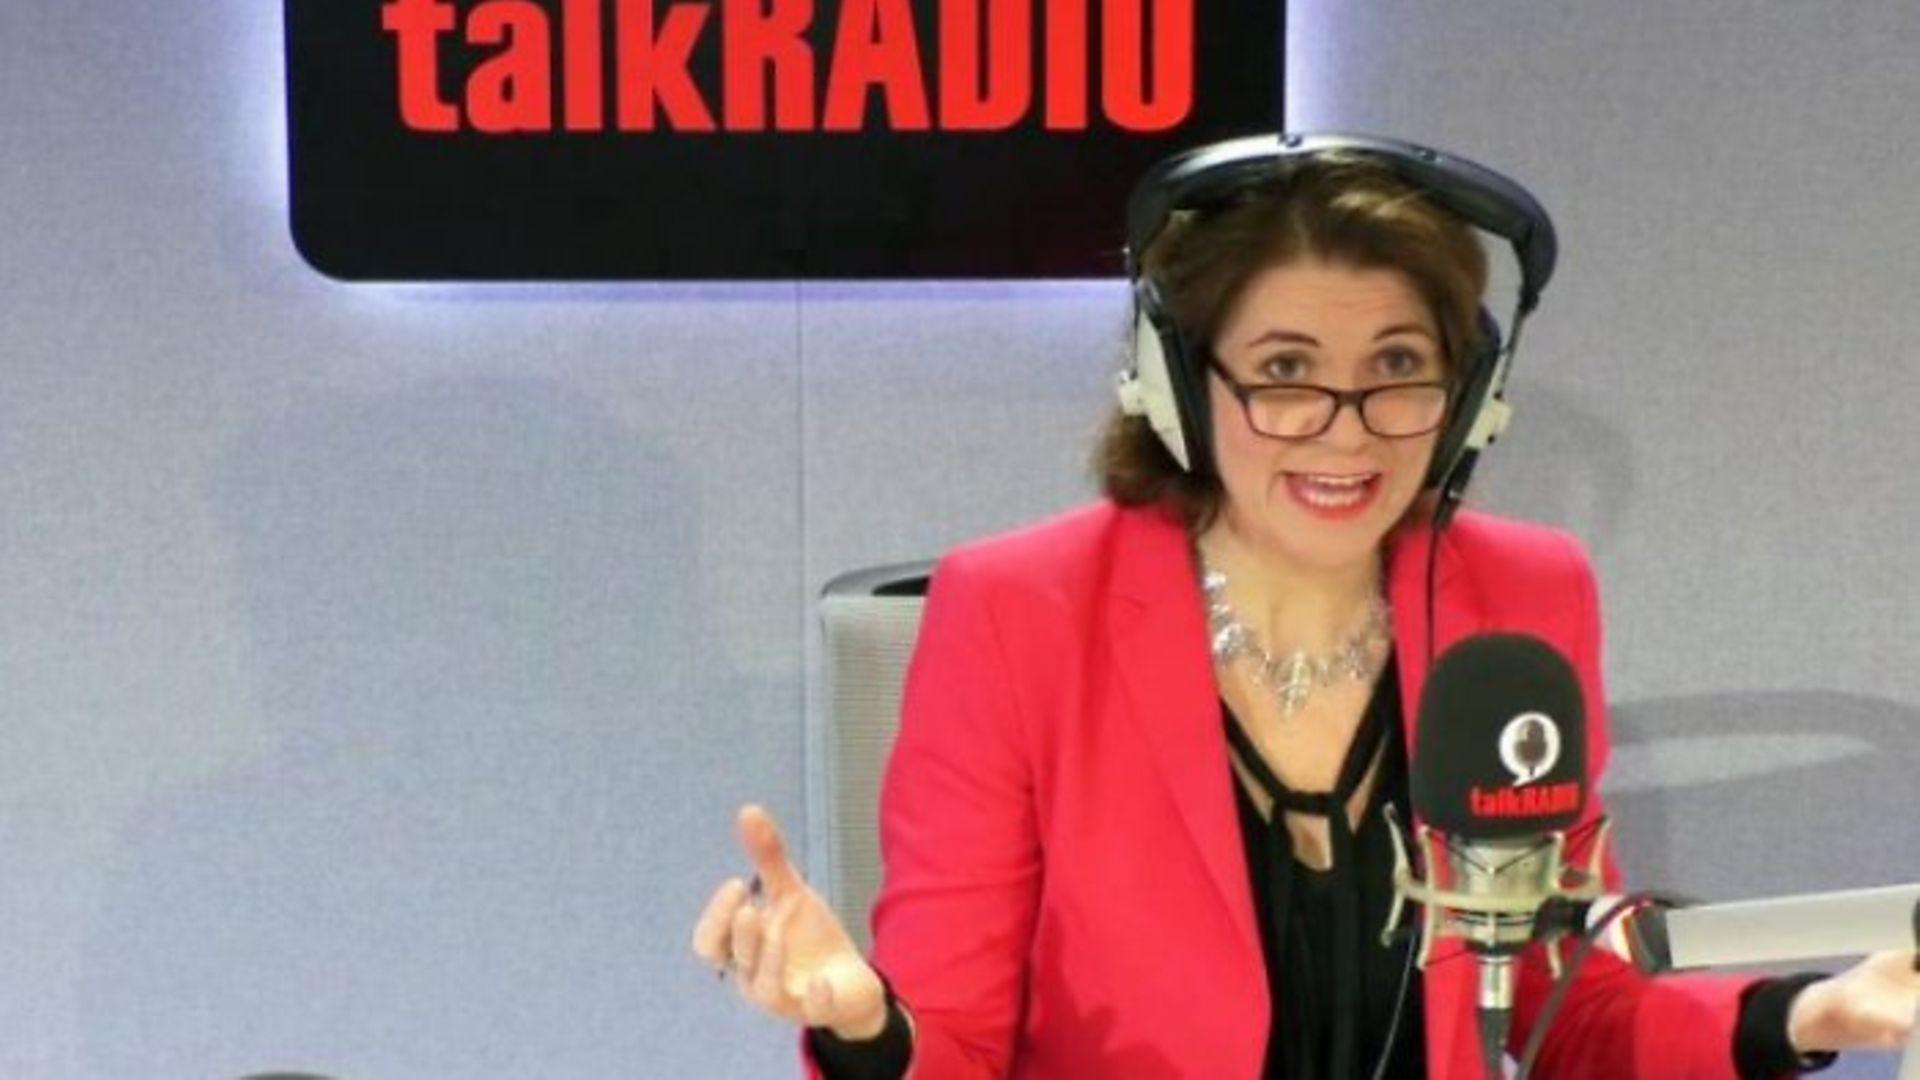 TalkRadio presenter Julia Hartley-Brewer - Credit: Twitter